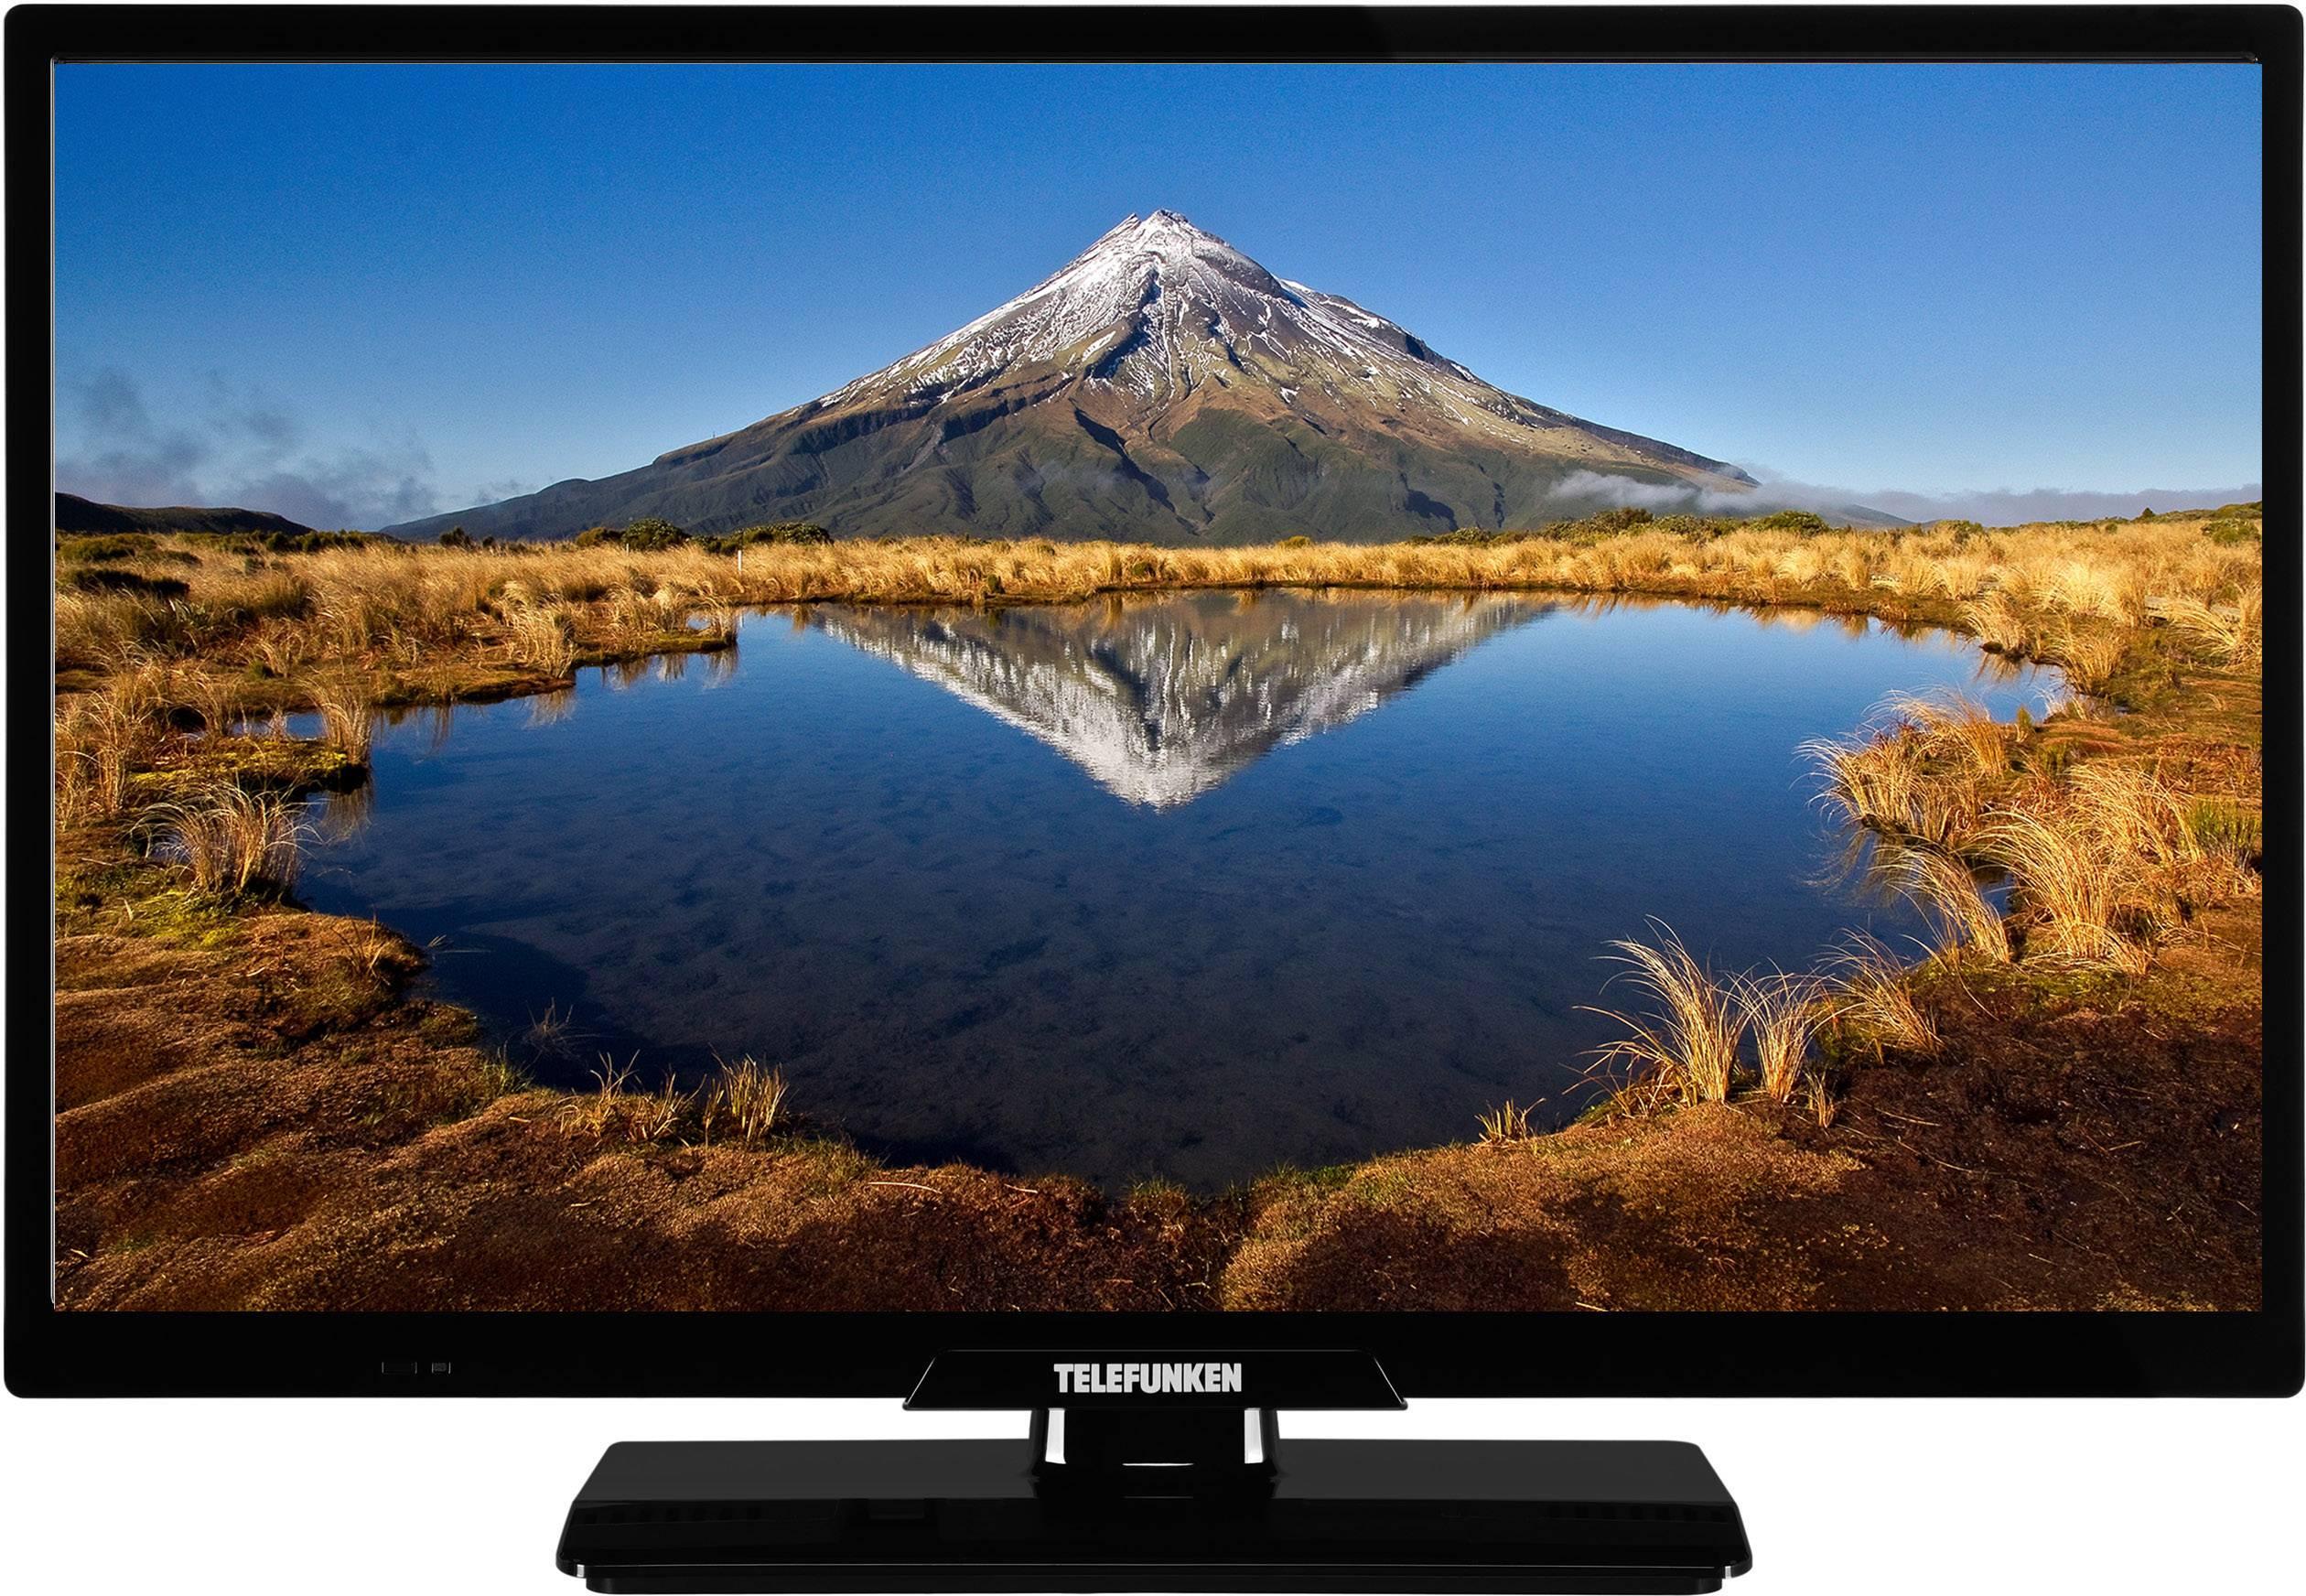 telefunken d24h340a led tv 60 cm 24 inch eec a a e dvb t2 dvb c dvb s hd ready ci black